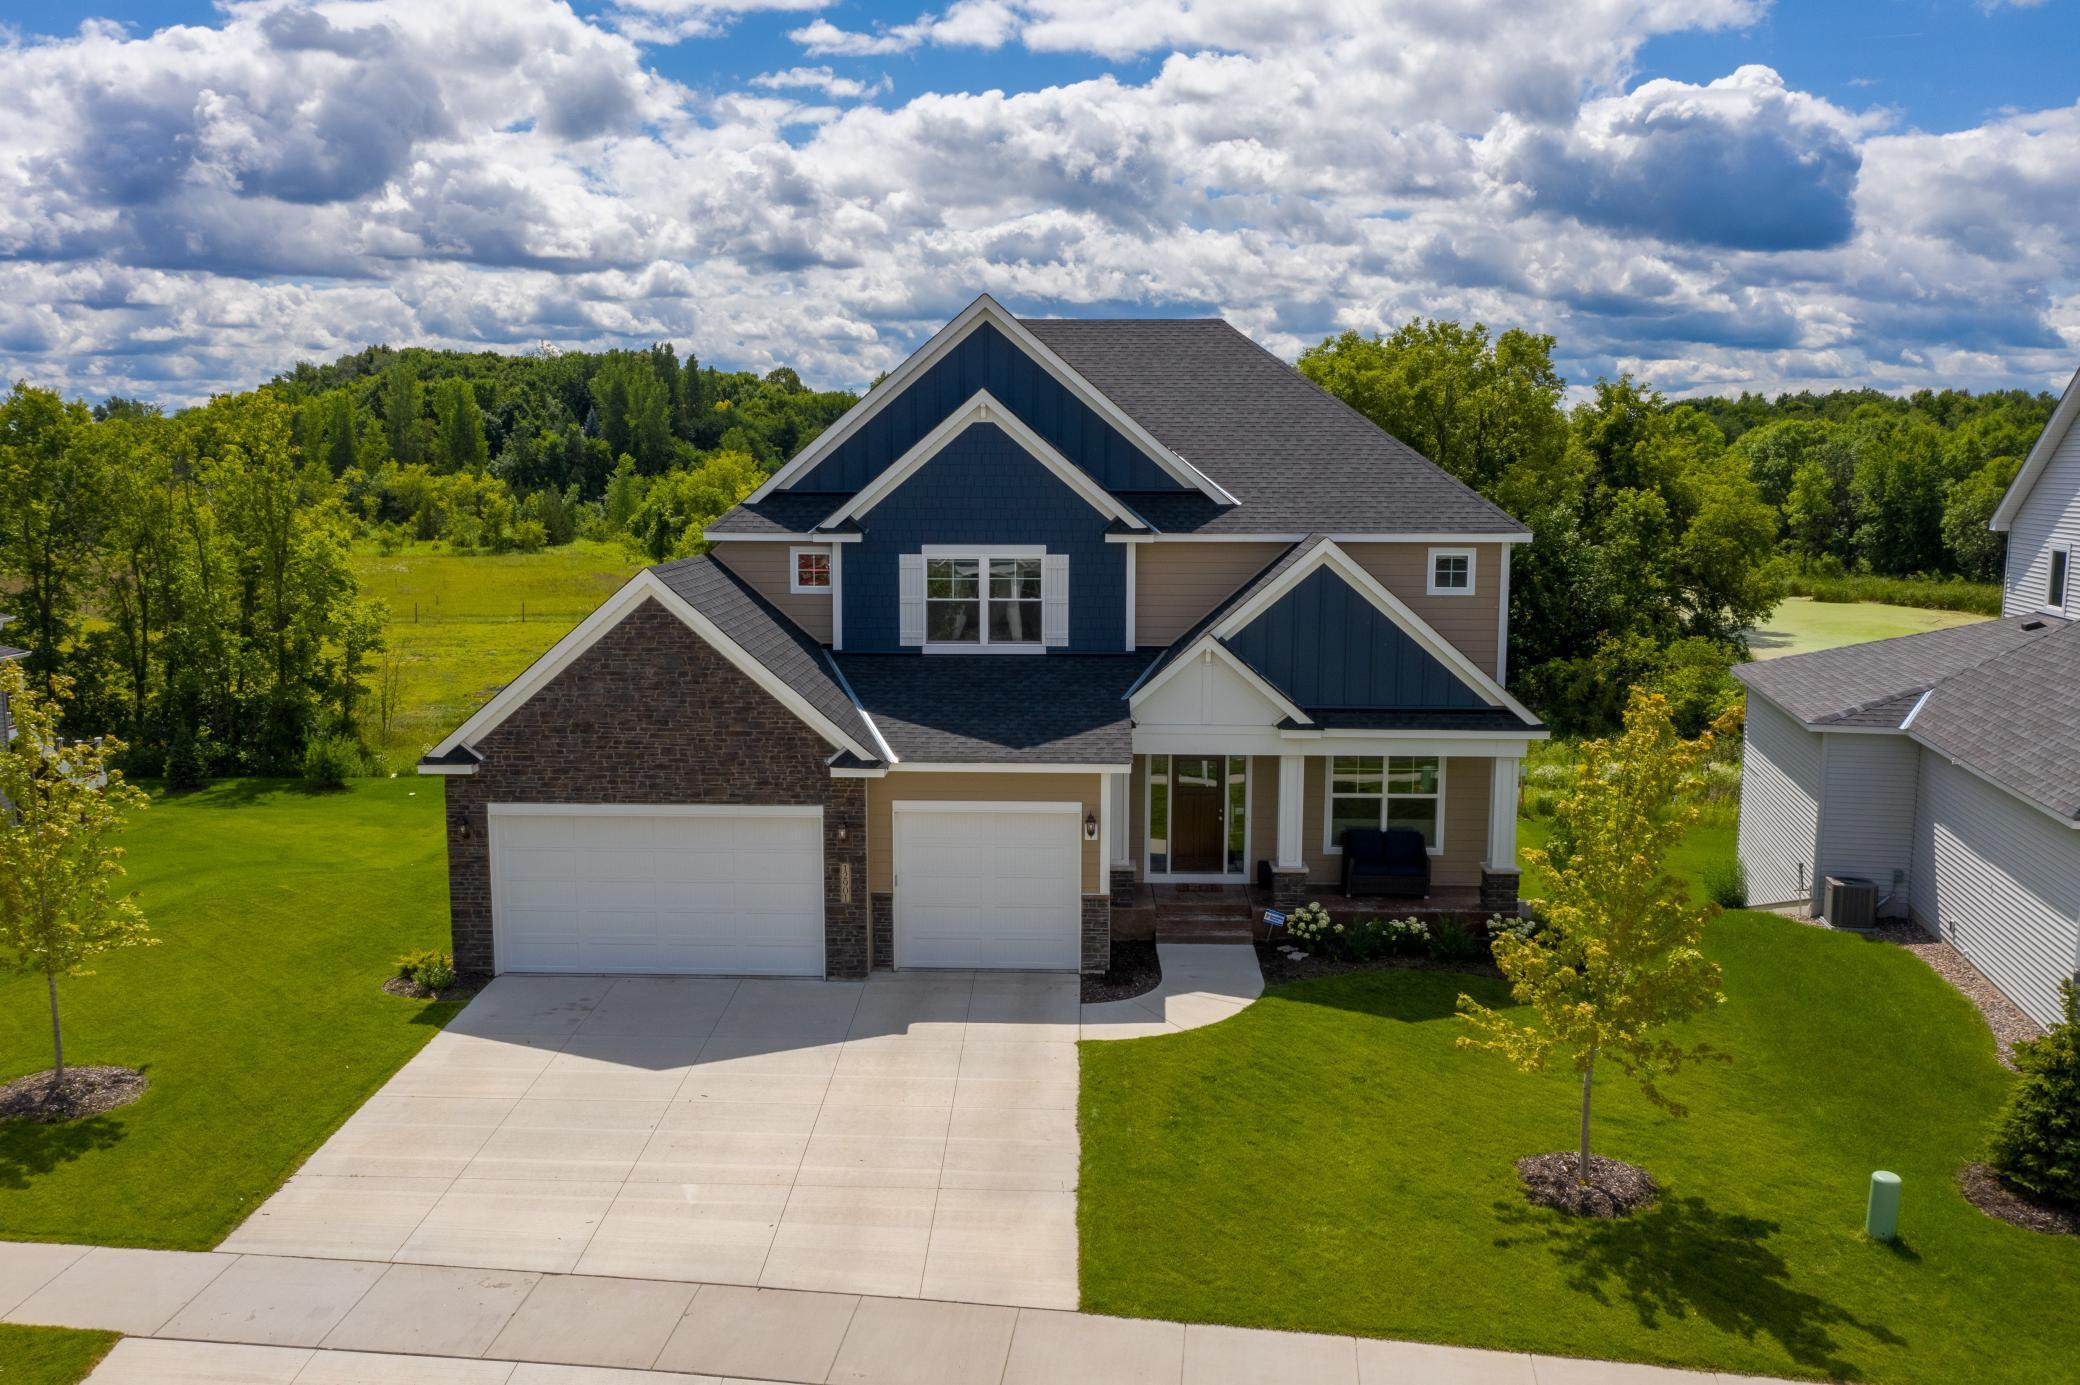 12901 137th Avenue N Property Photo - Dayton, MN real estate listing